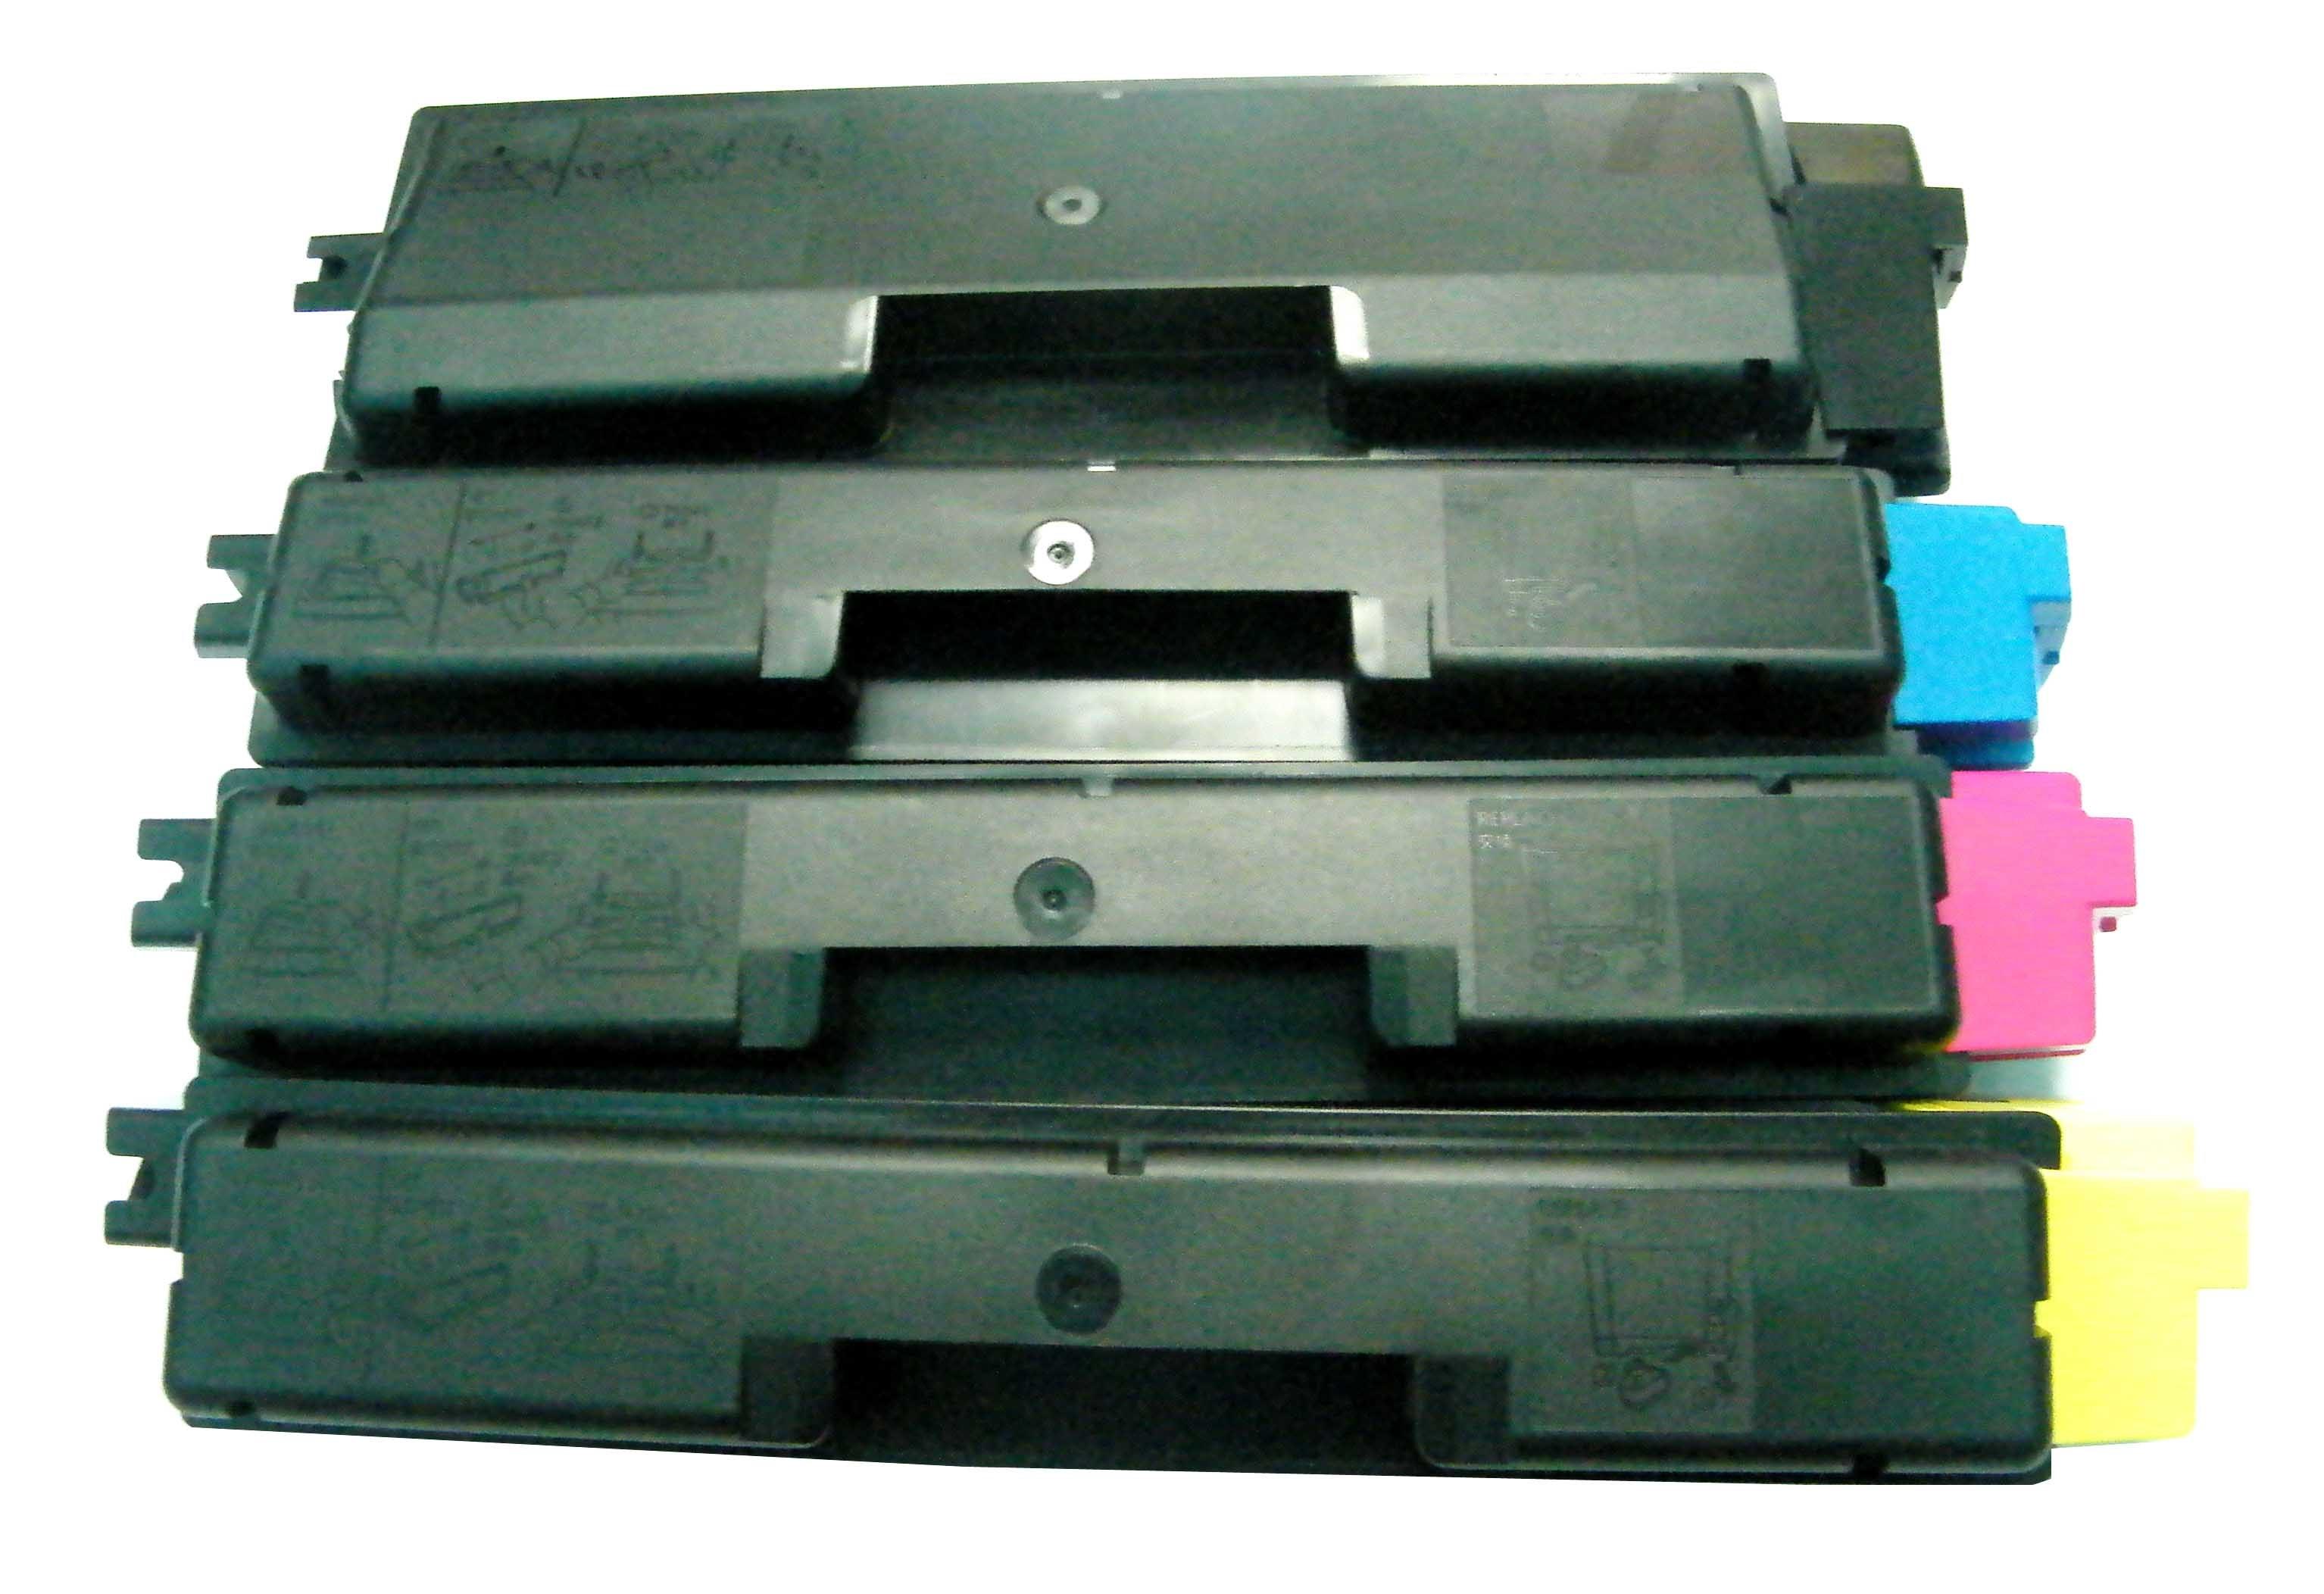 Laser Printer Toner Tk584 for Kyocera Printer Fs-C5150dn